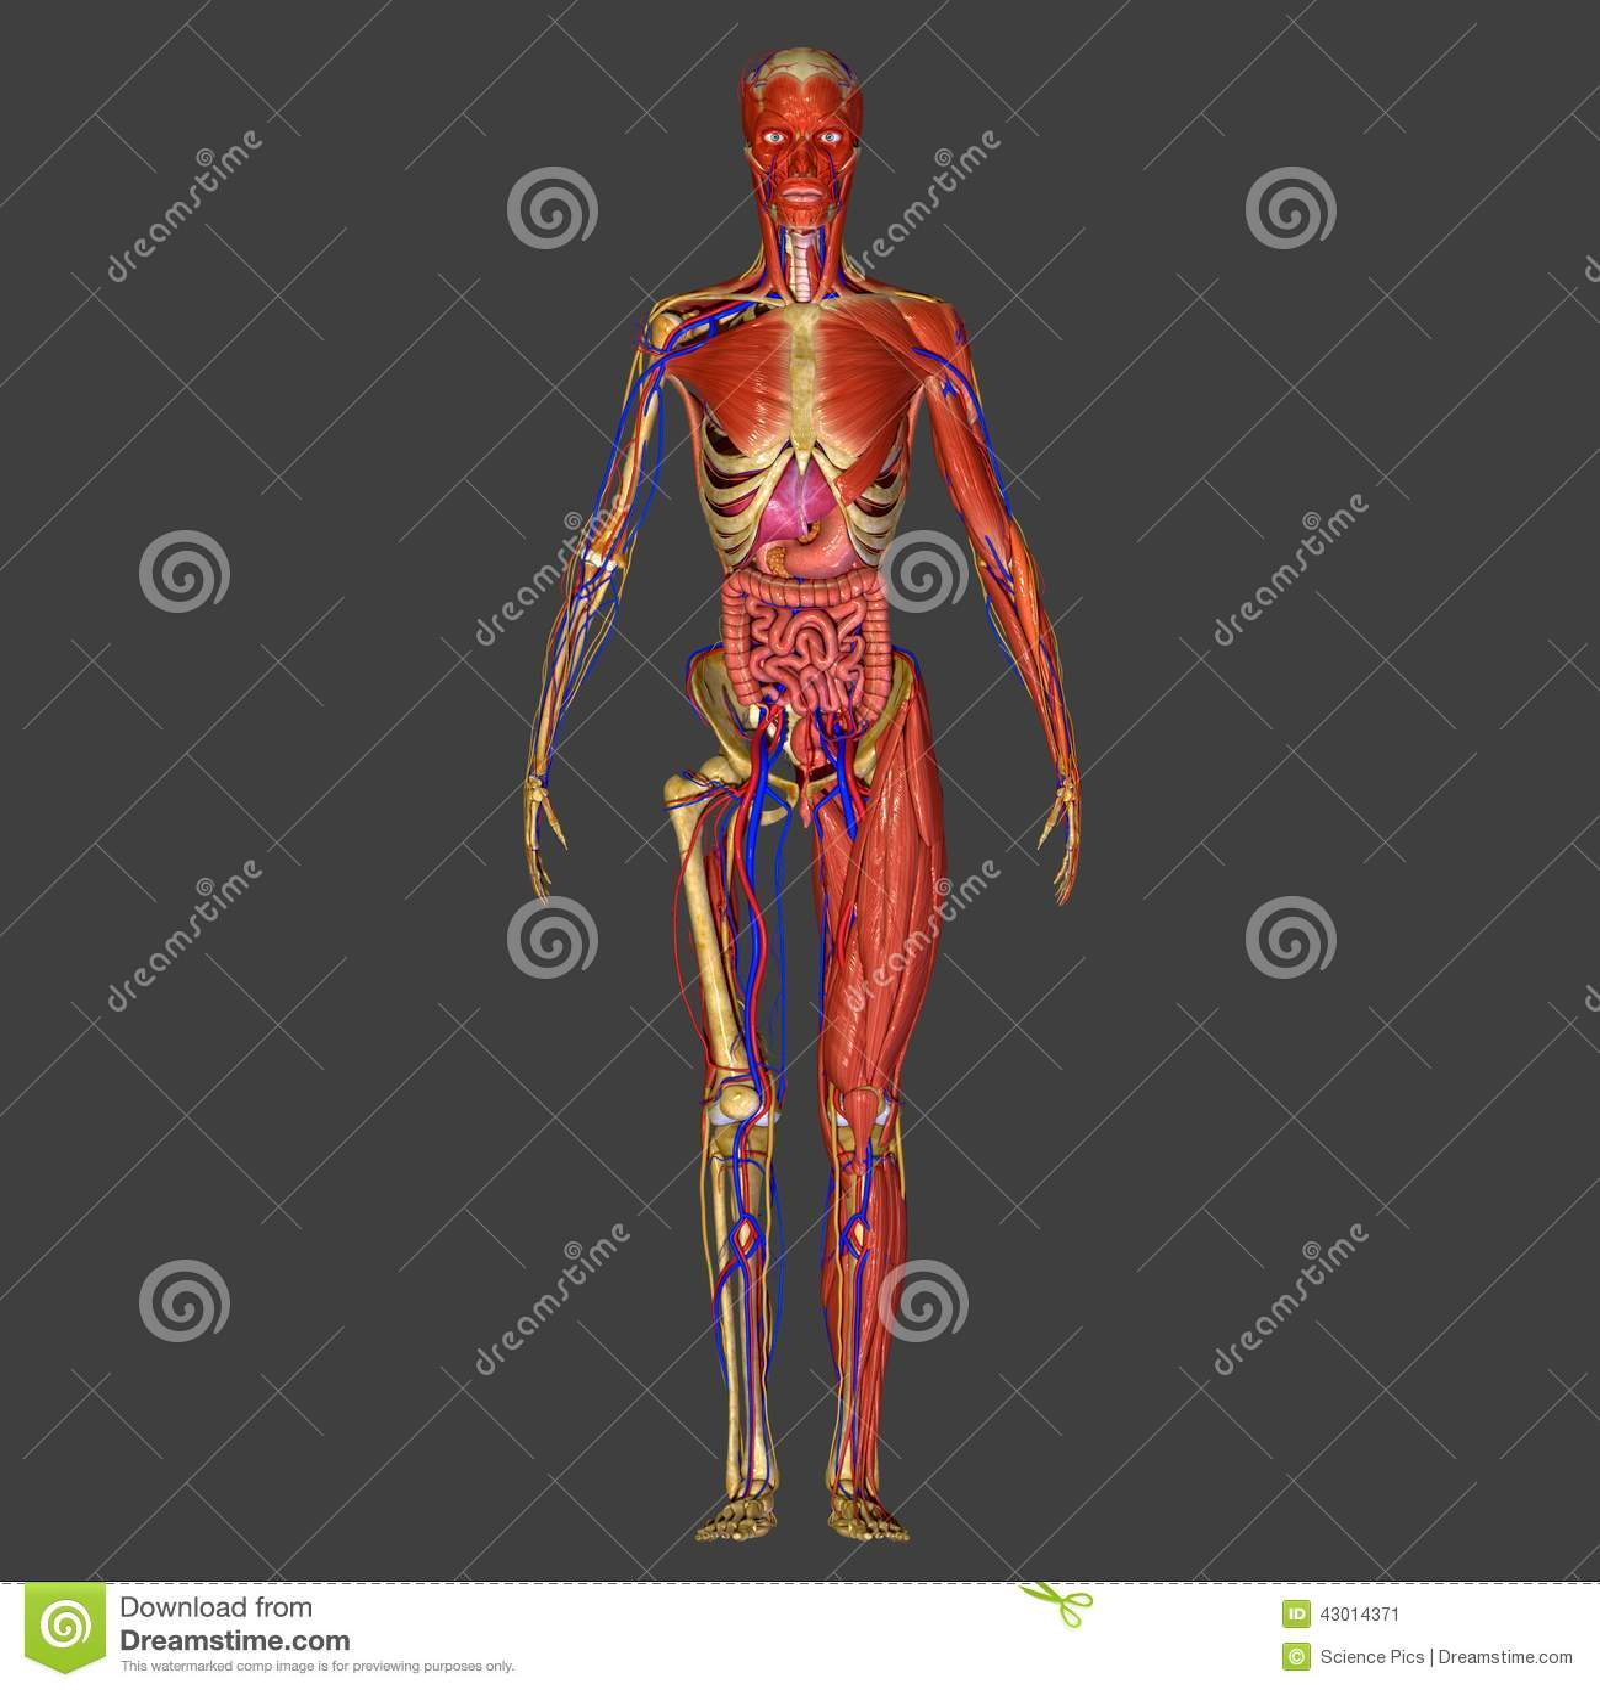 Human Anatomy stock illustration. Illustration of anatomy - 43014371